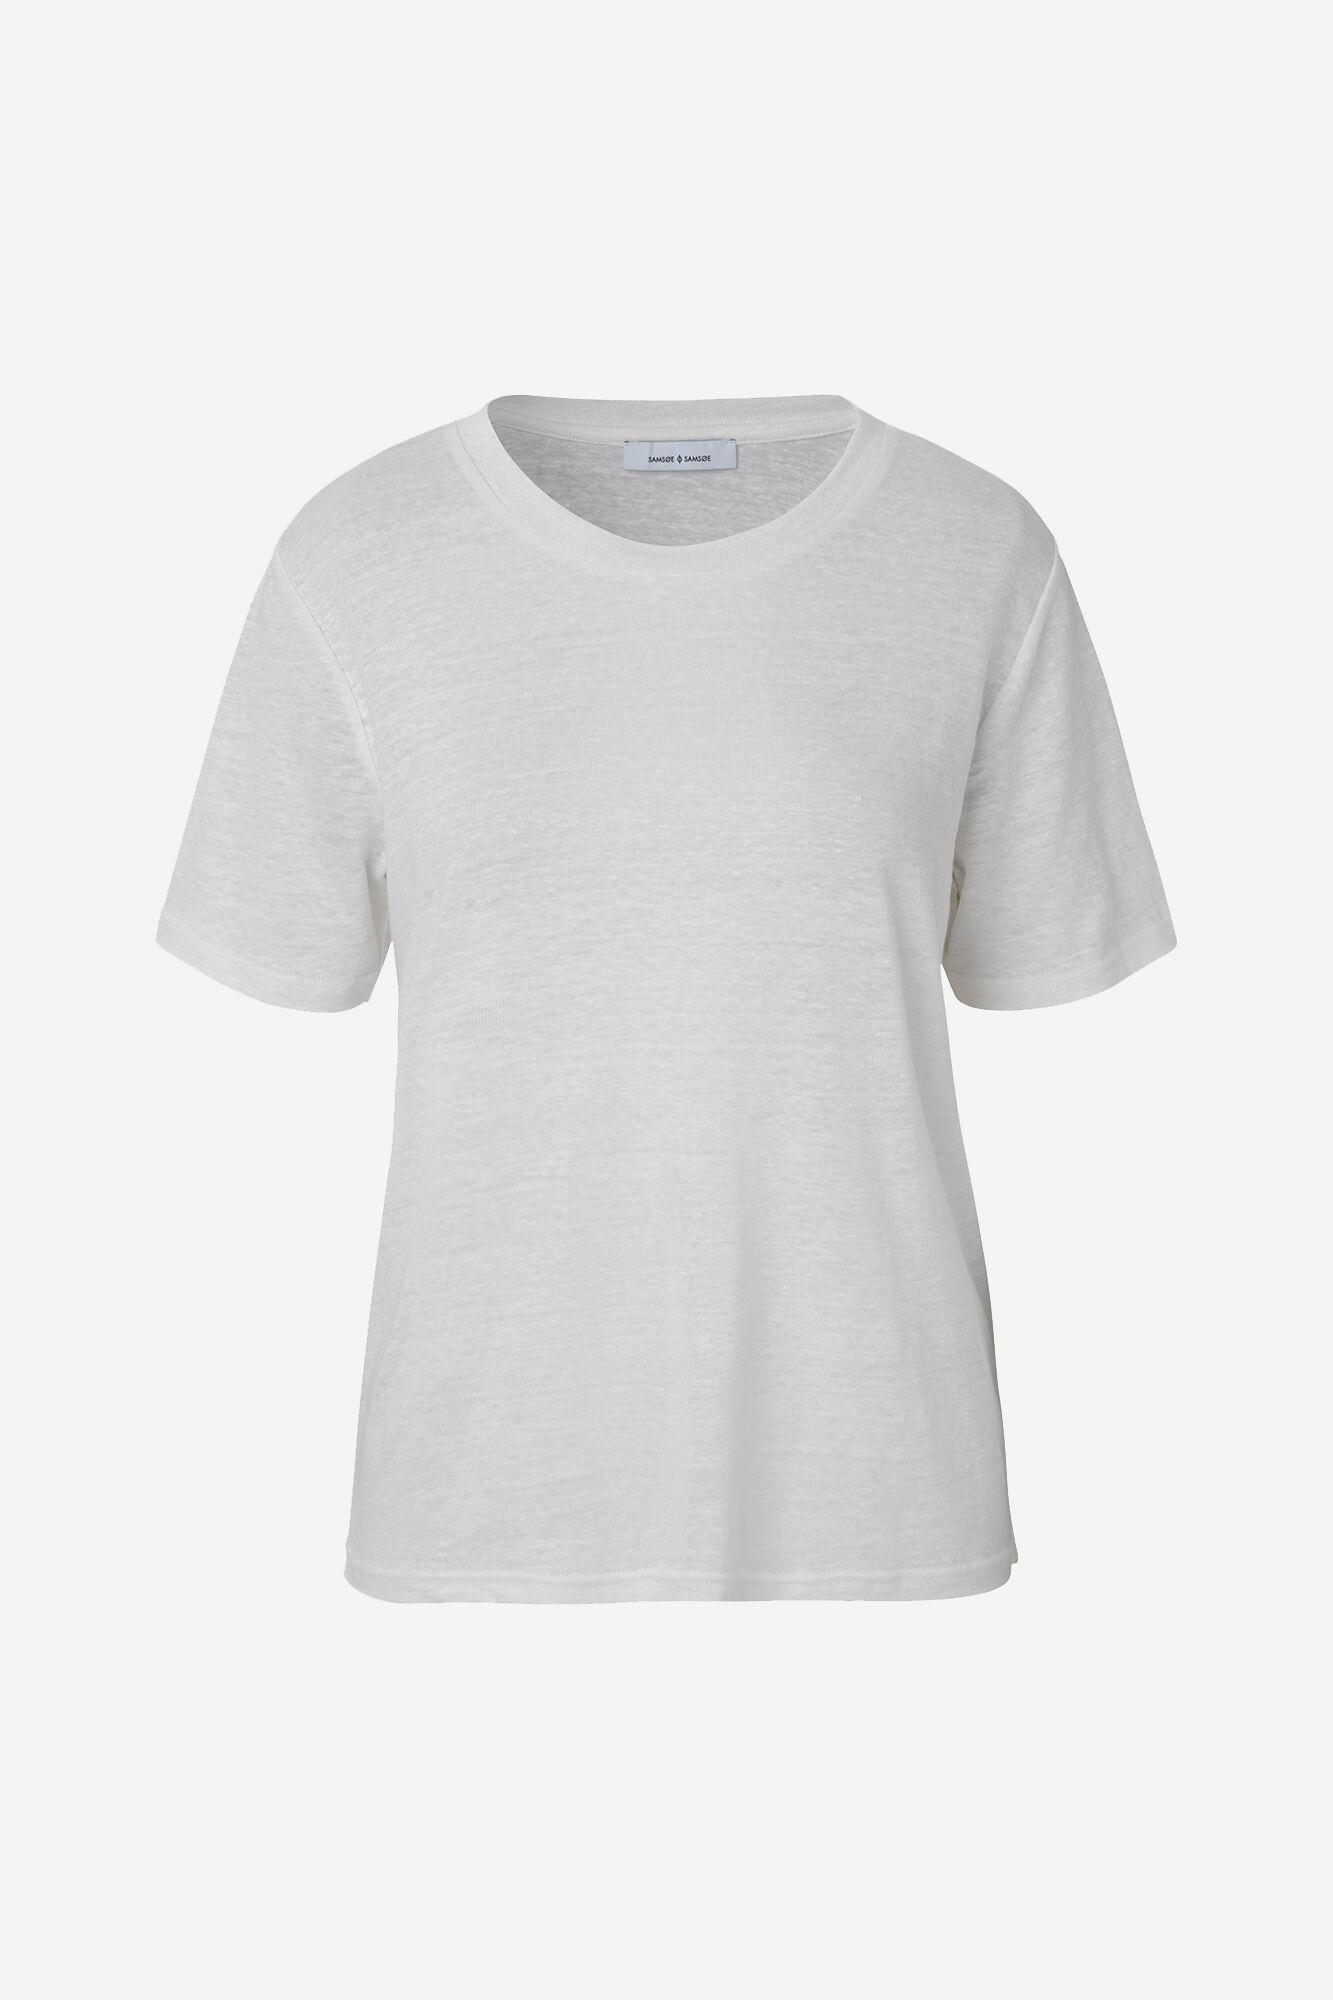 SAMSOE t-shirt agnes-6